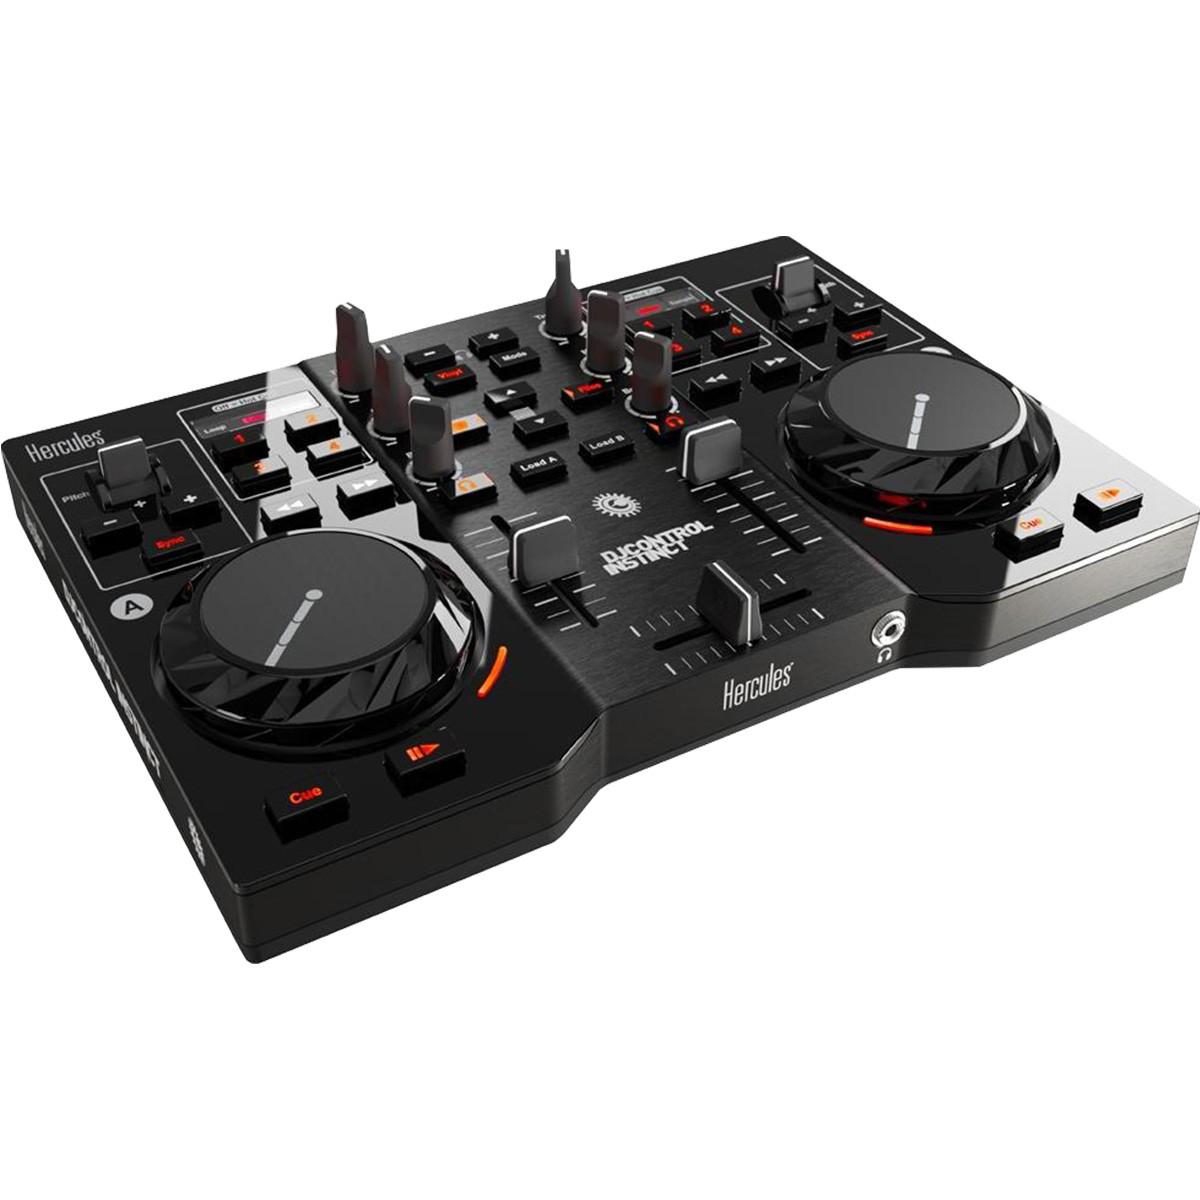 Hercules DJ Control Instinct Controladora Dj, Usb